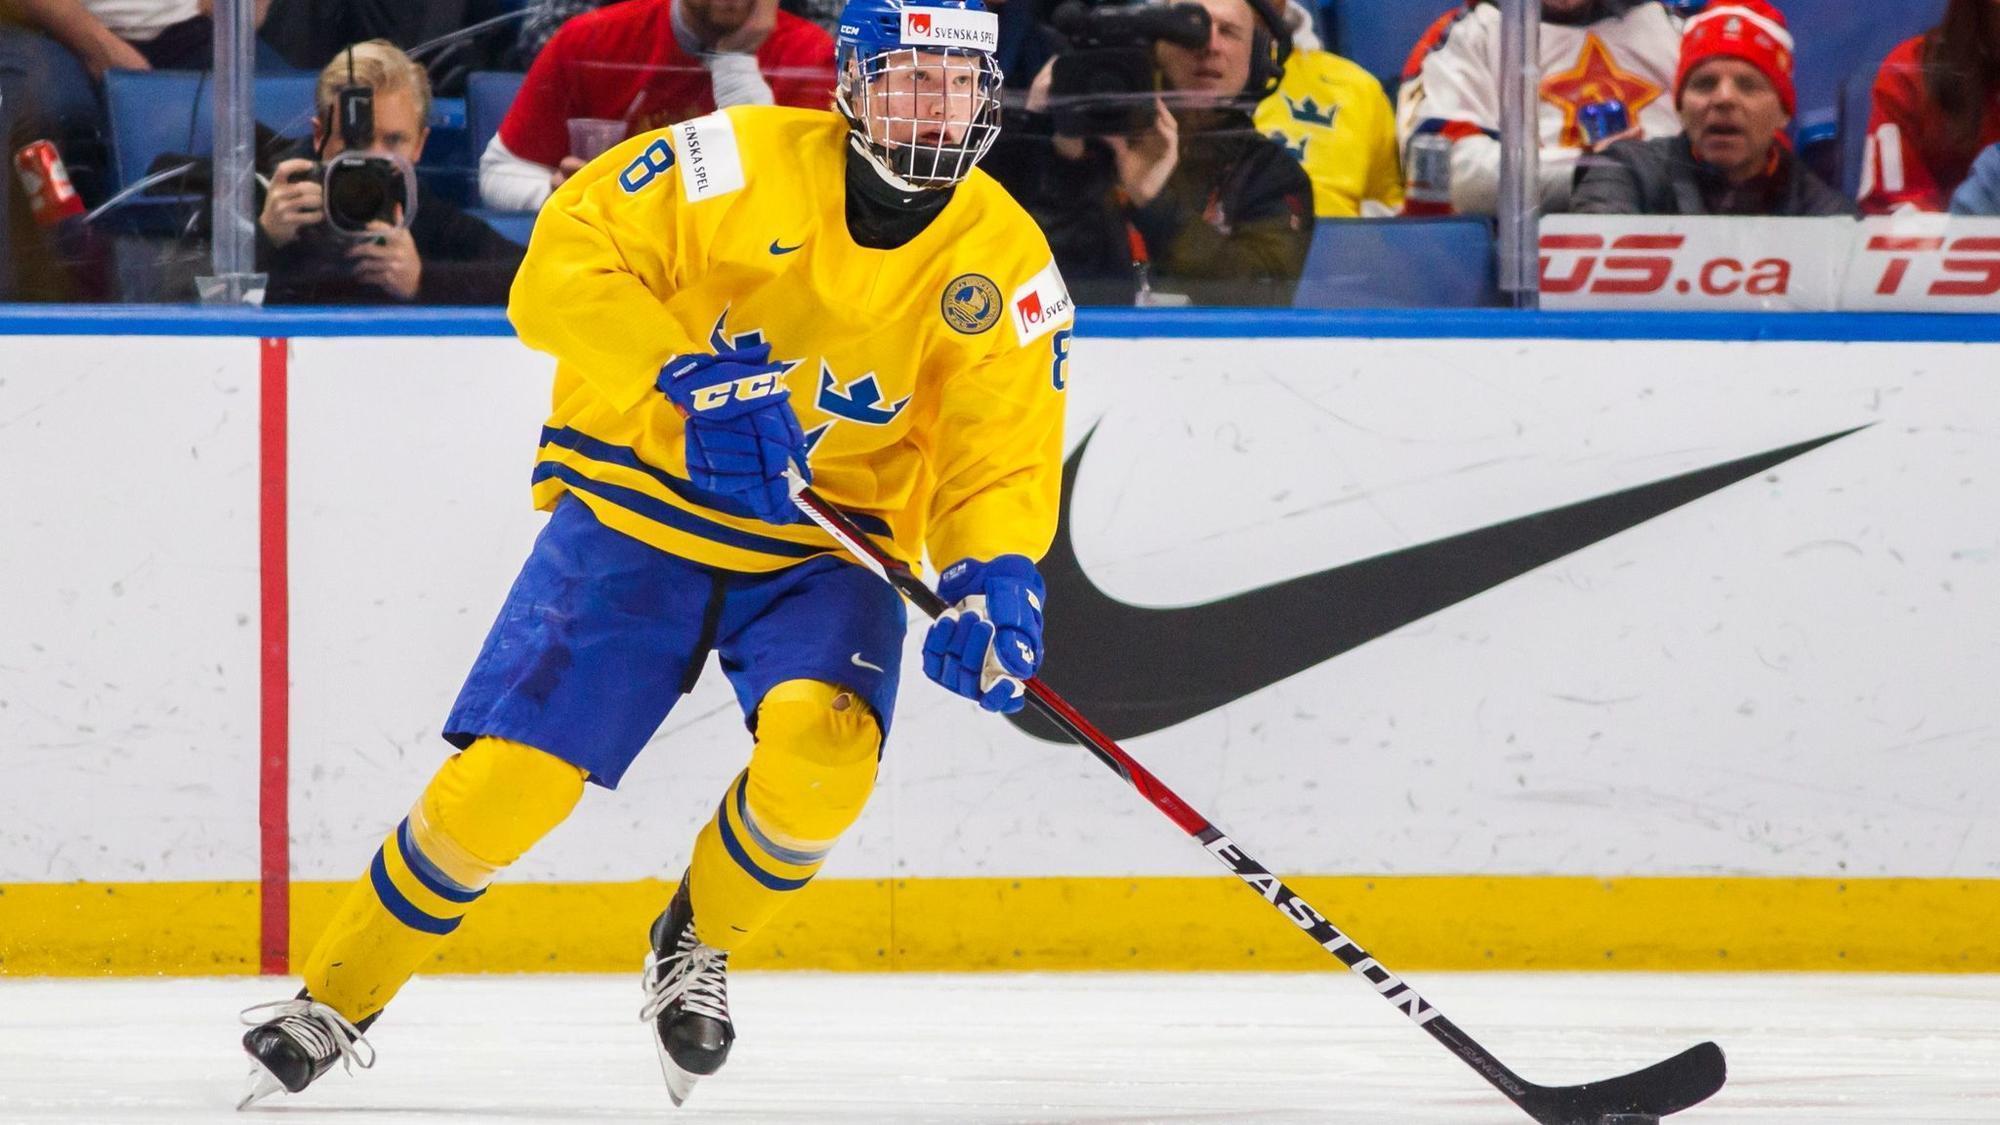 Ct-spt-olympic-hockey-blackhawks-fans-20180207